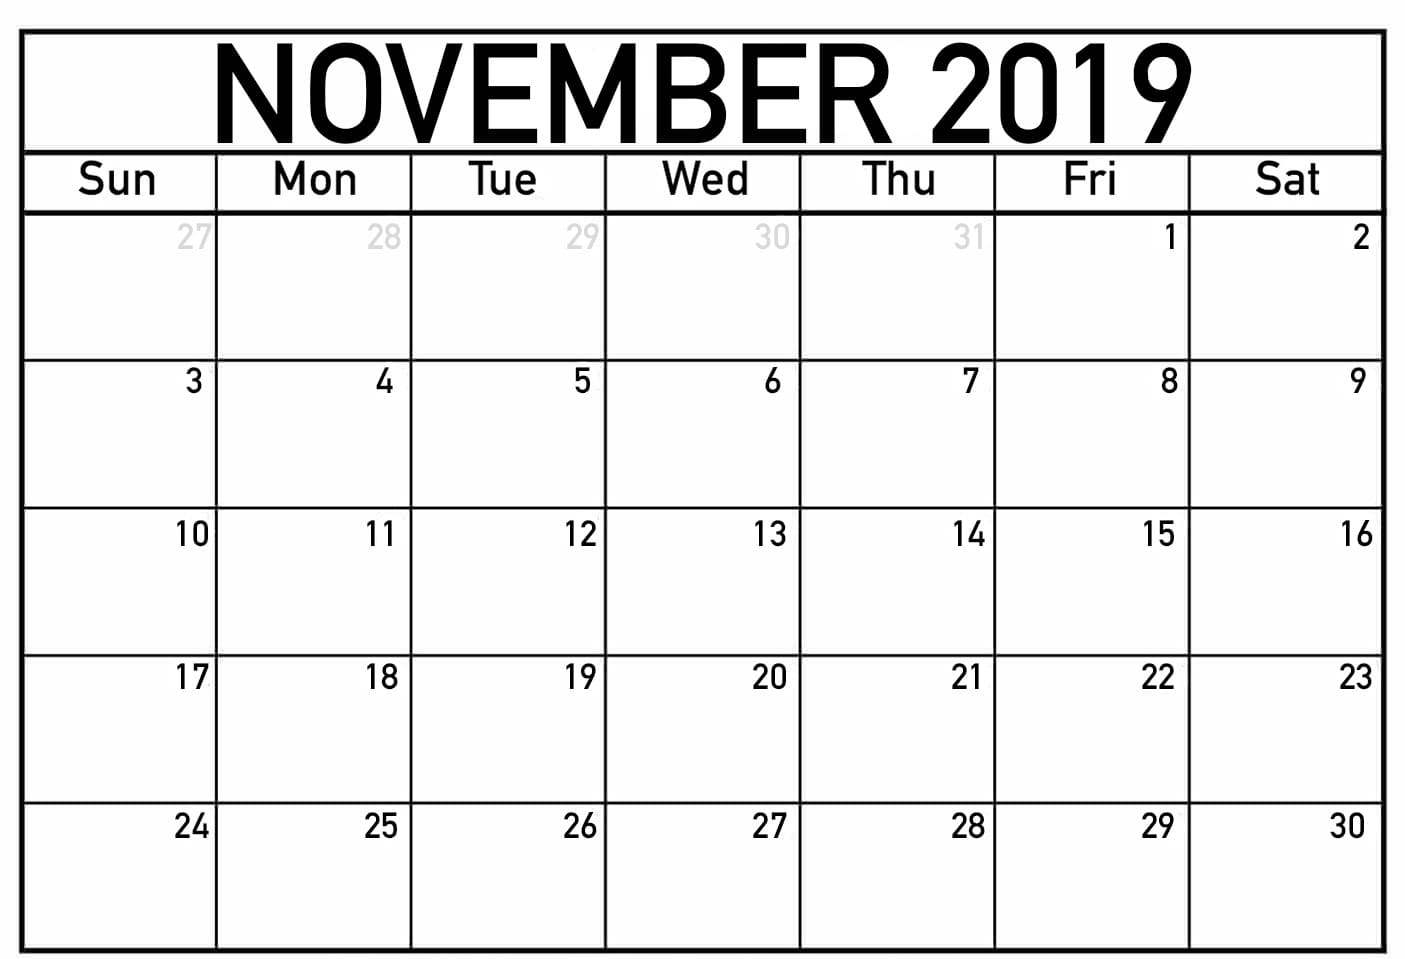 November 2019 Calendar Blank Template Free